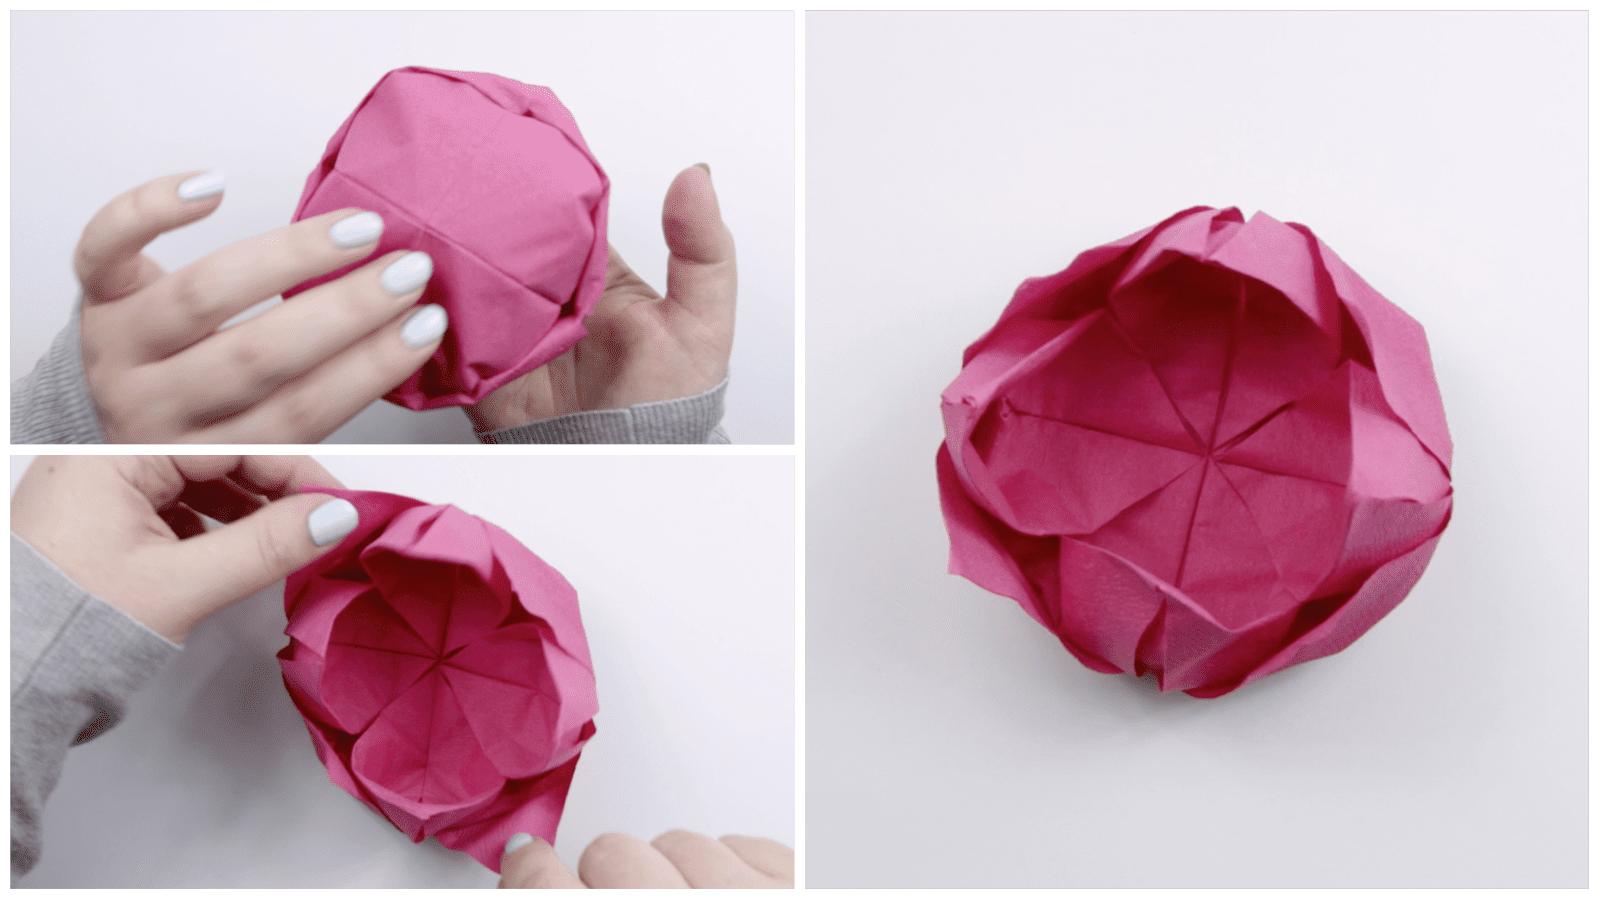 How To Make An Origami Napkin Lotus